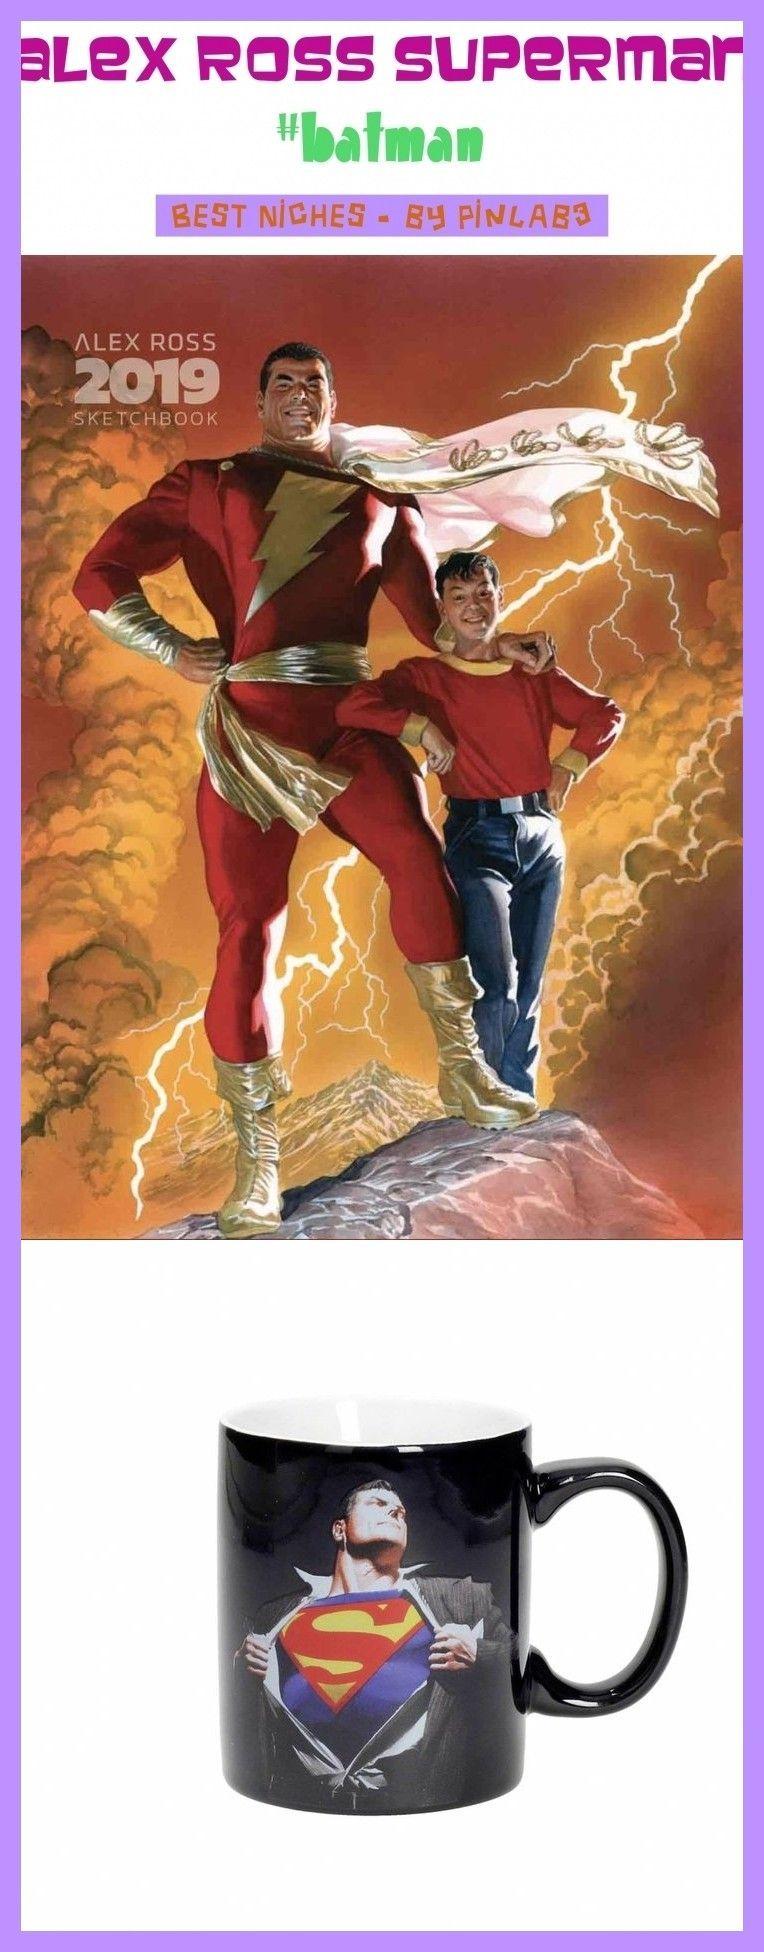 alex ross superman alex ross batman, alex r ...